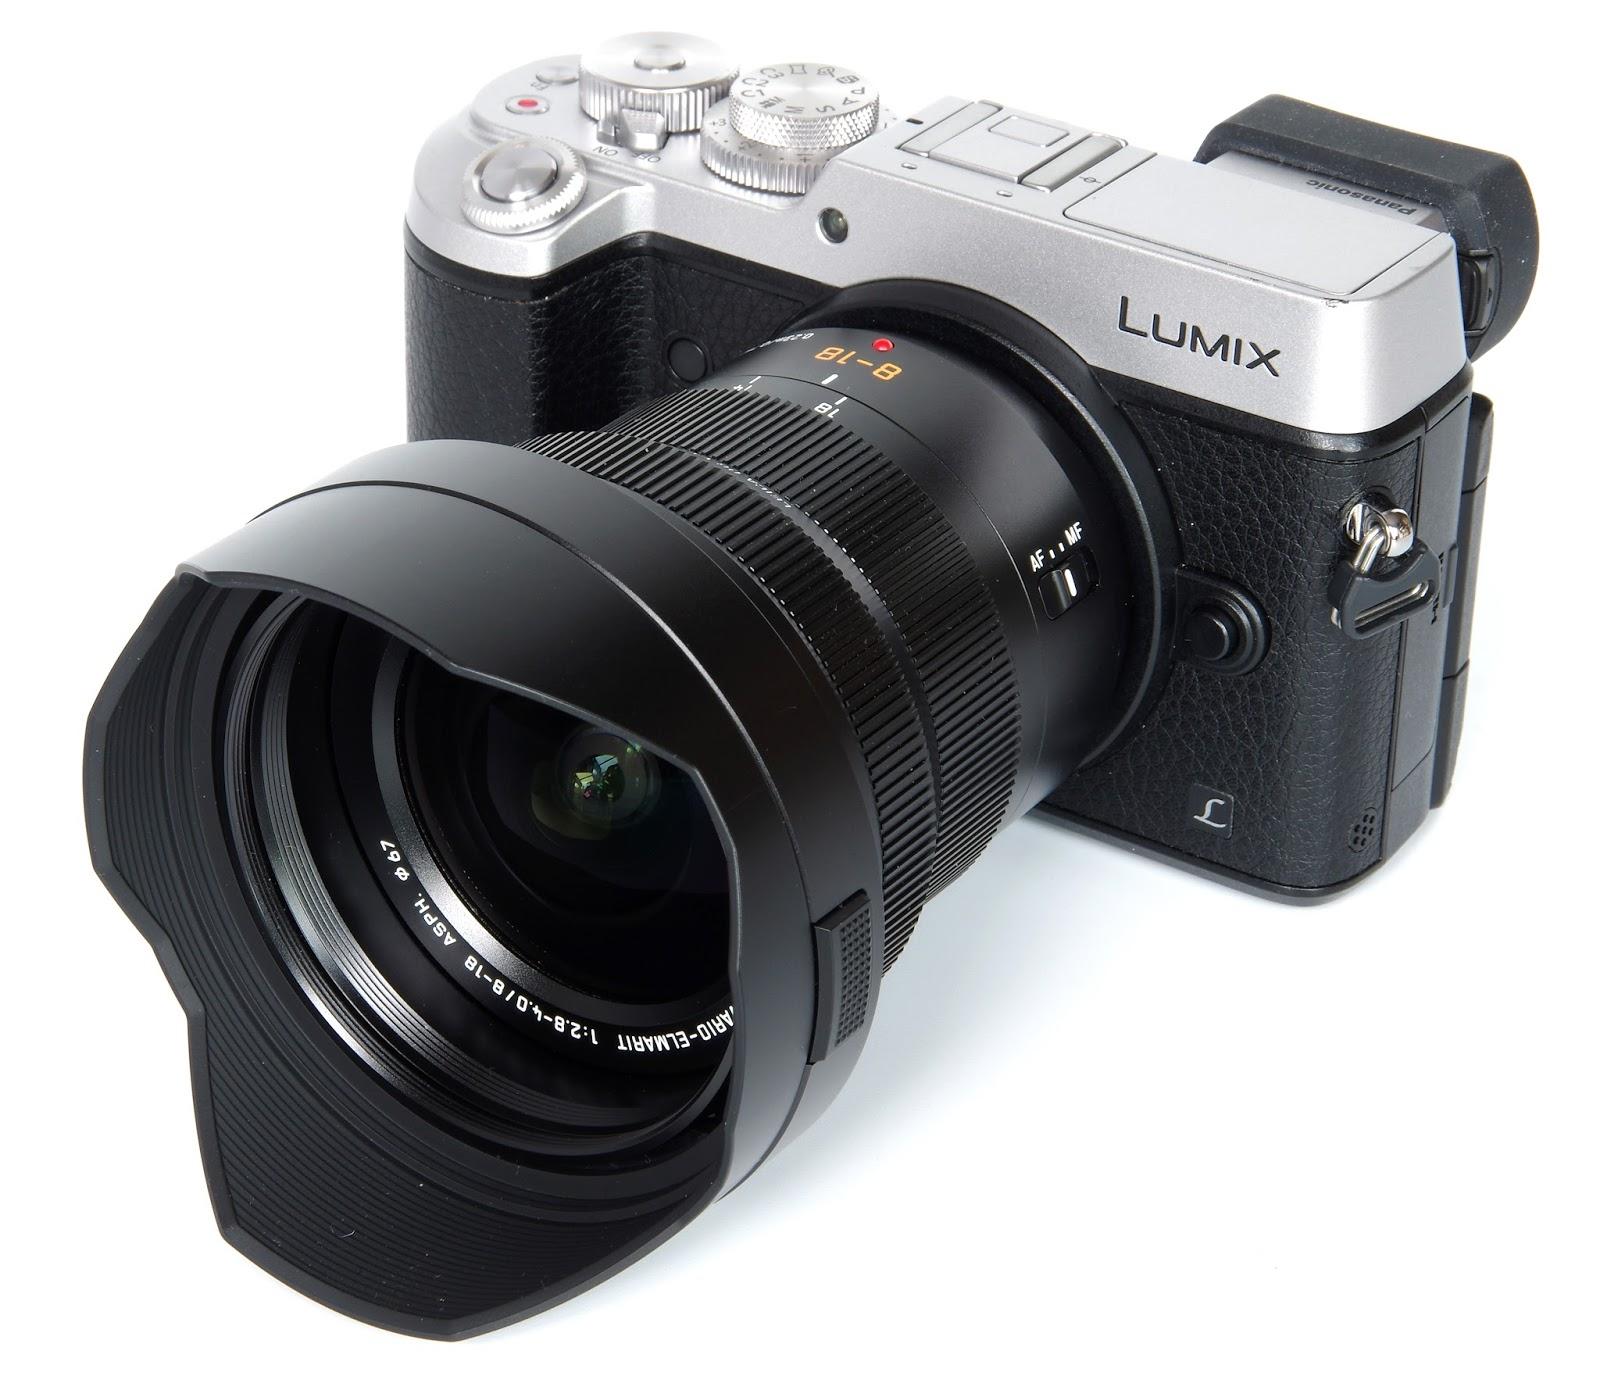 Panasonic Leica DG Vario-Elmarit 8-18mm f/2.8-4 Asph. с камерой Pansonic Lumix GX8